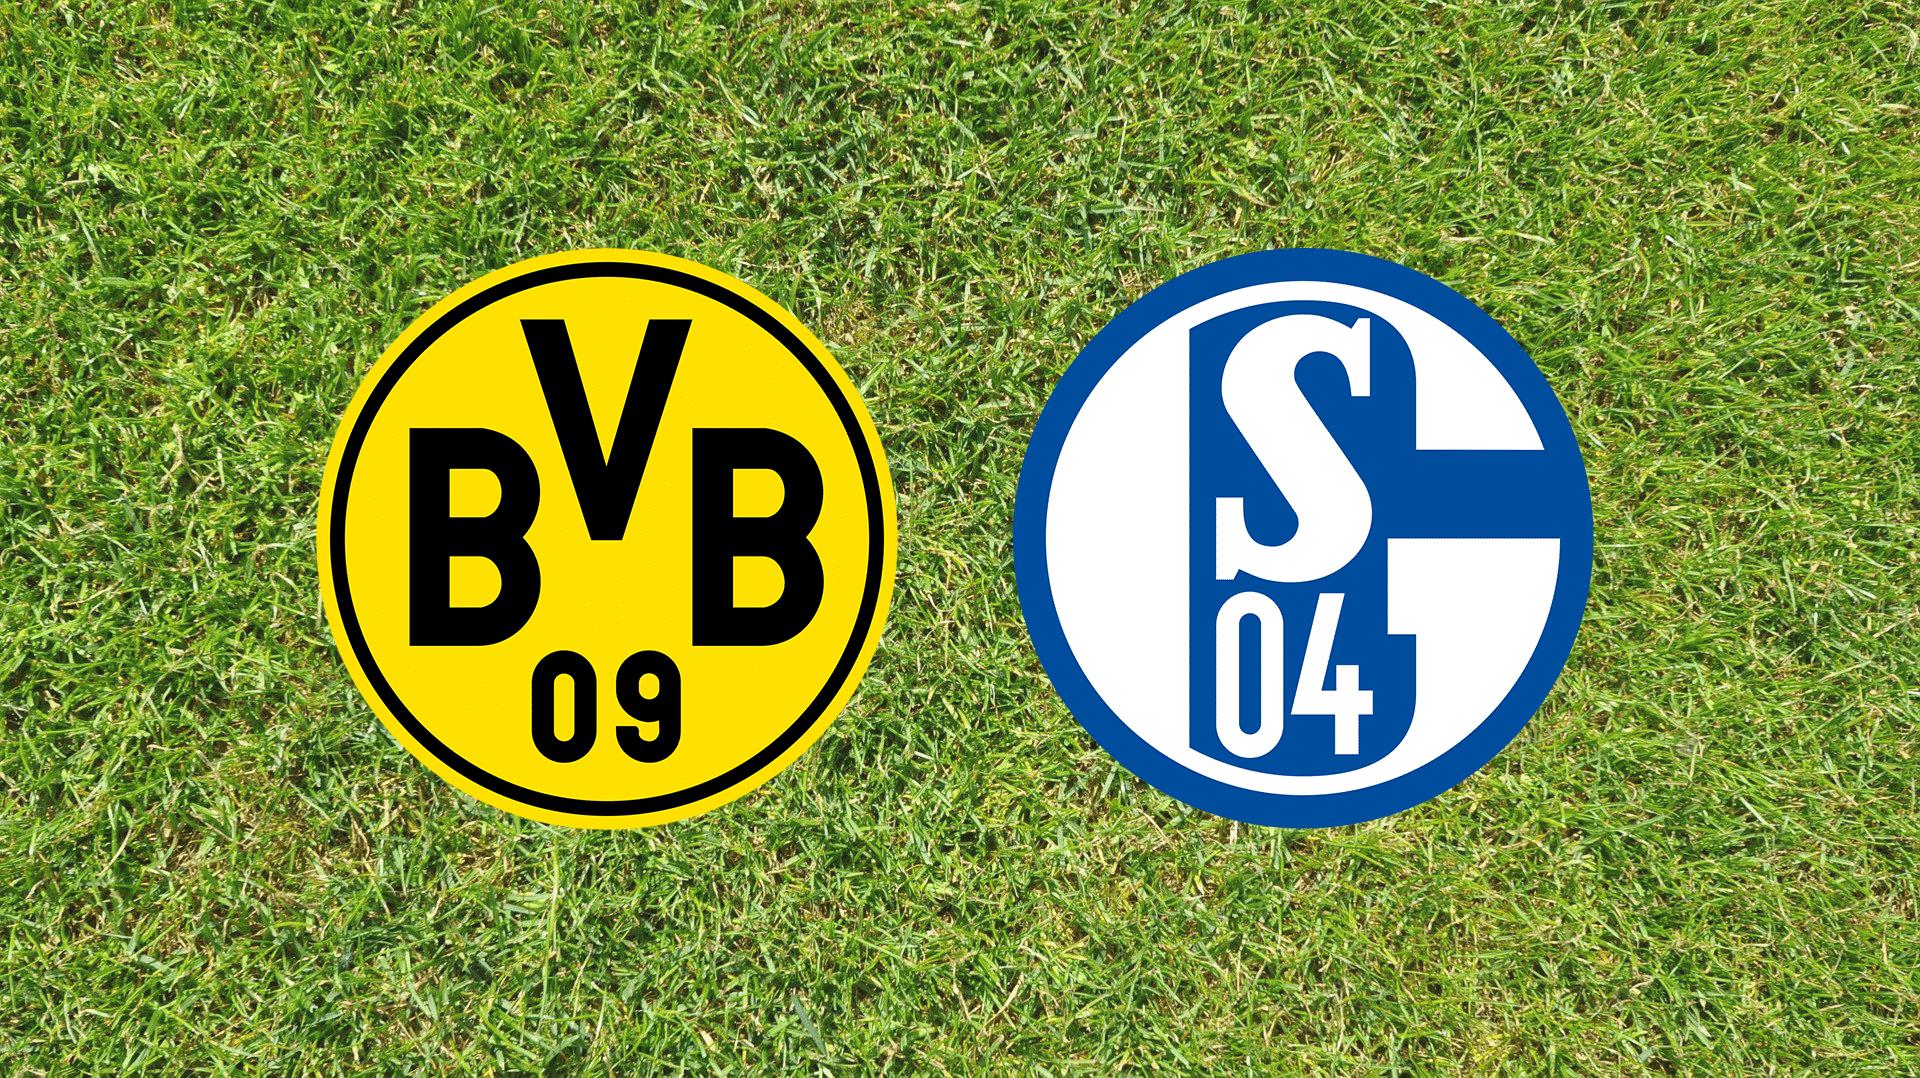 Livestream Bvb Schalke